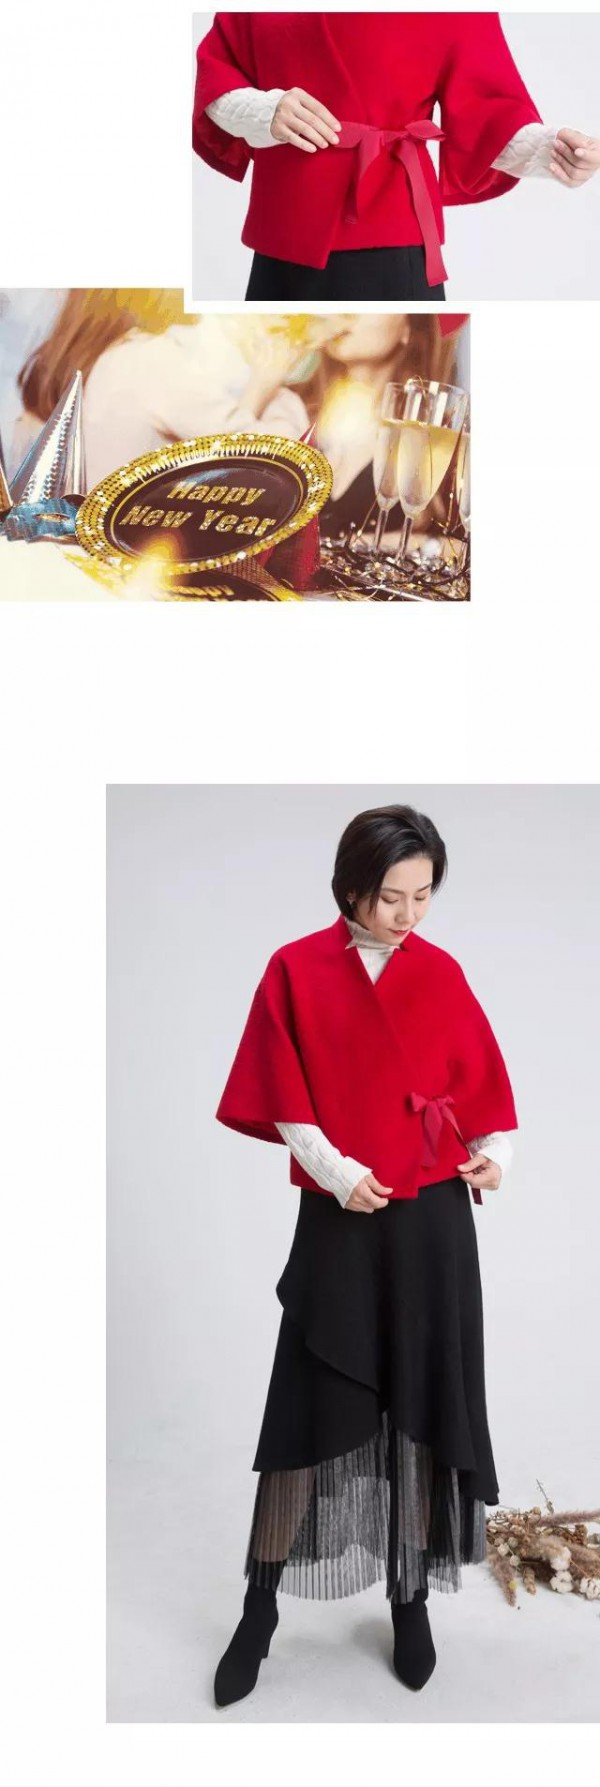 A-LINE春季新款红大衣 与您迎新春接好运